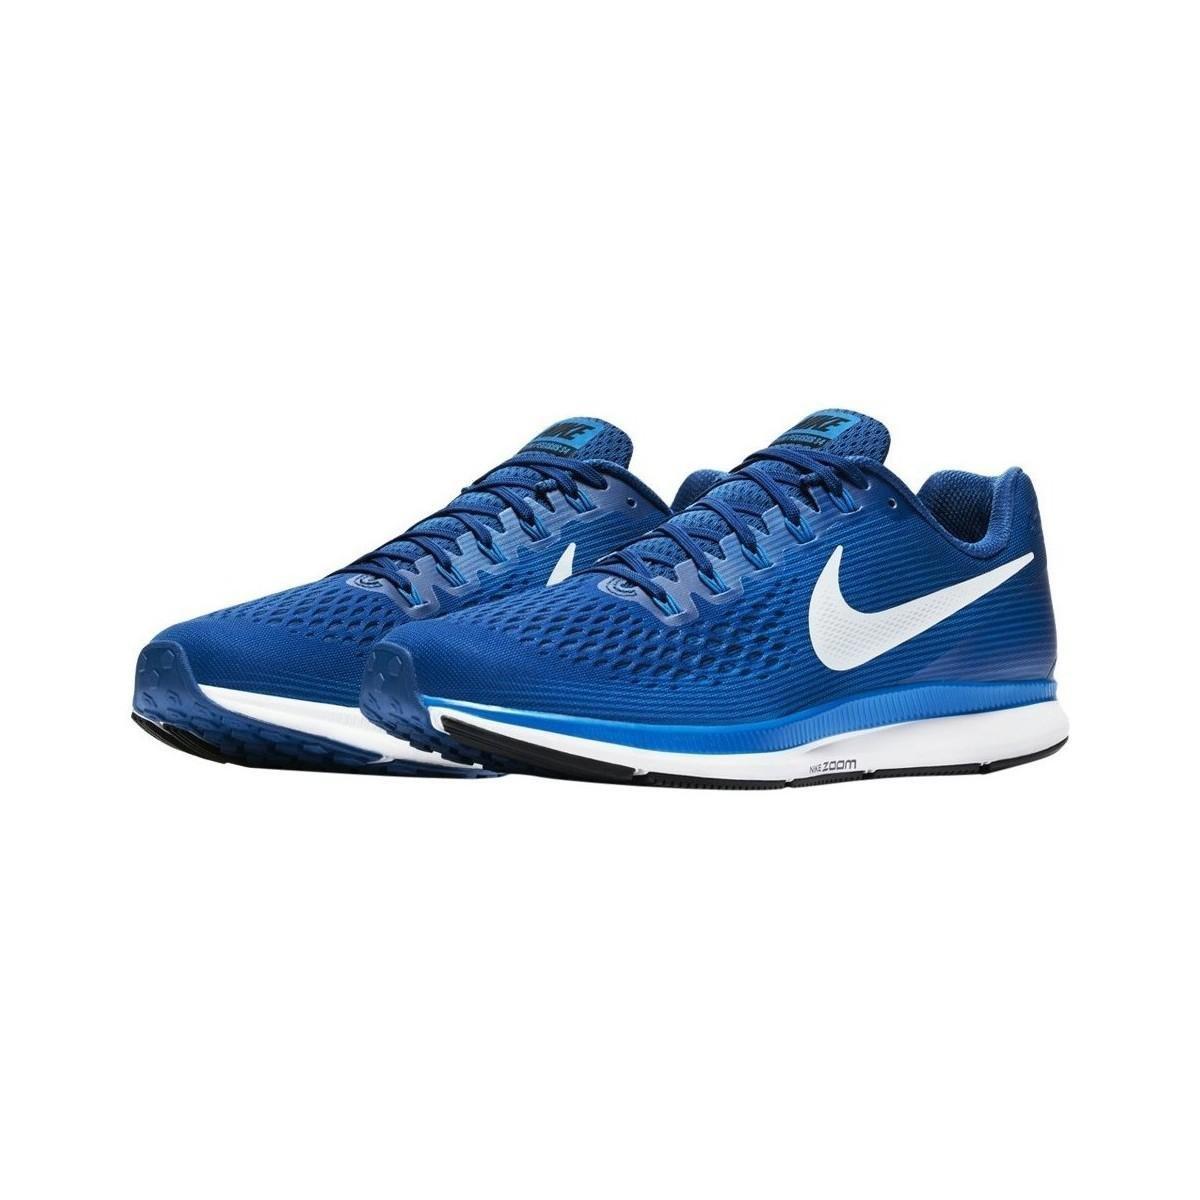 separation shoes 0c3bd 5547d Nike - Air Zoom Pegasus 34 M Men s Shoes (trainers) In Blue for Men. View  fullscreen